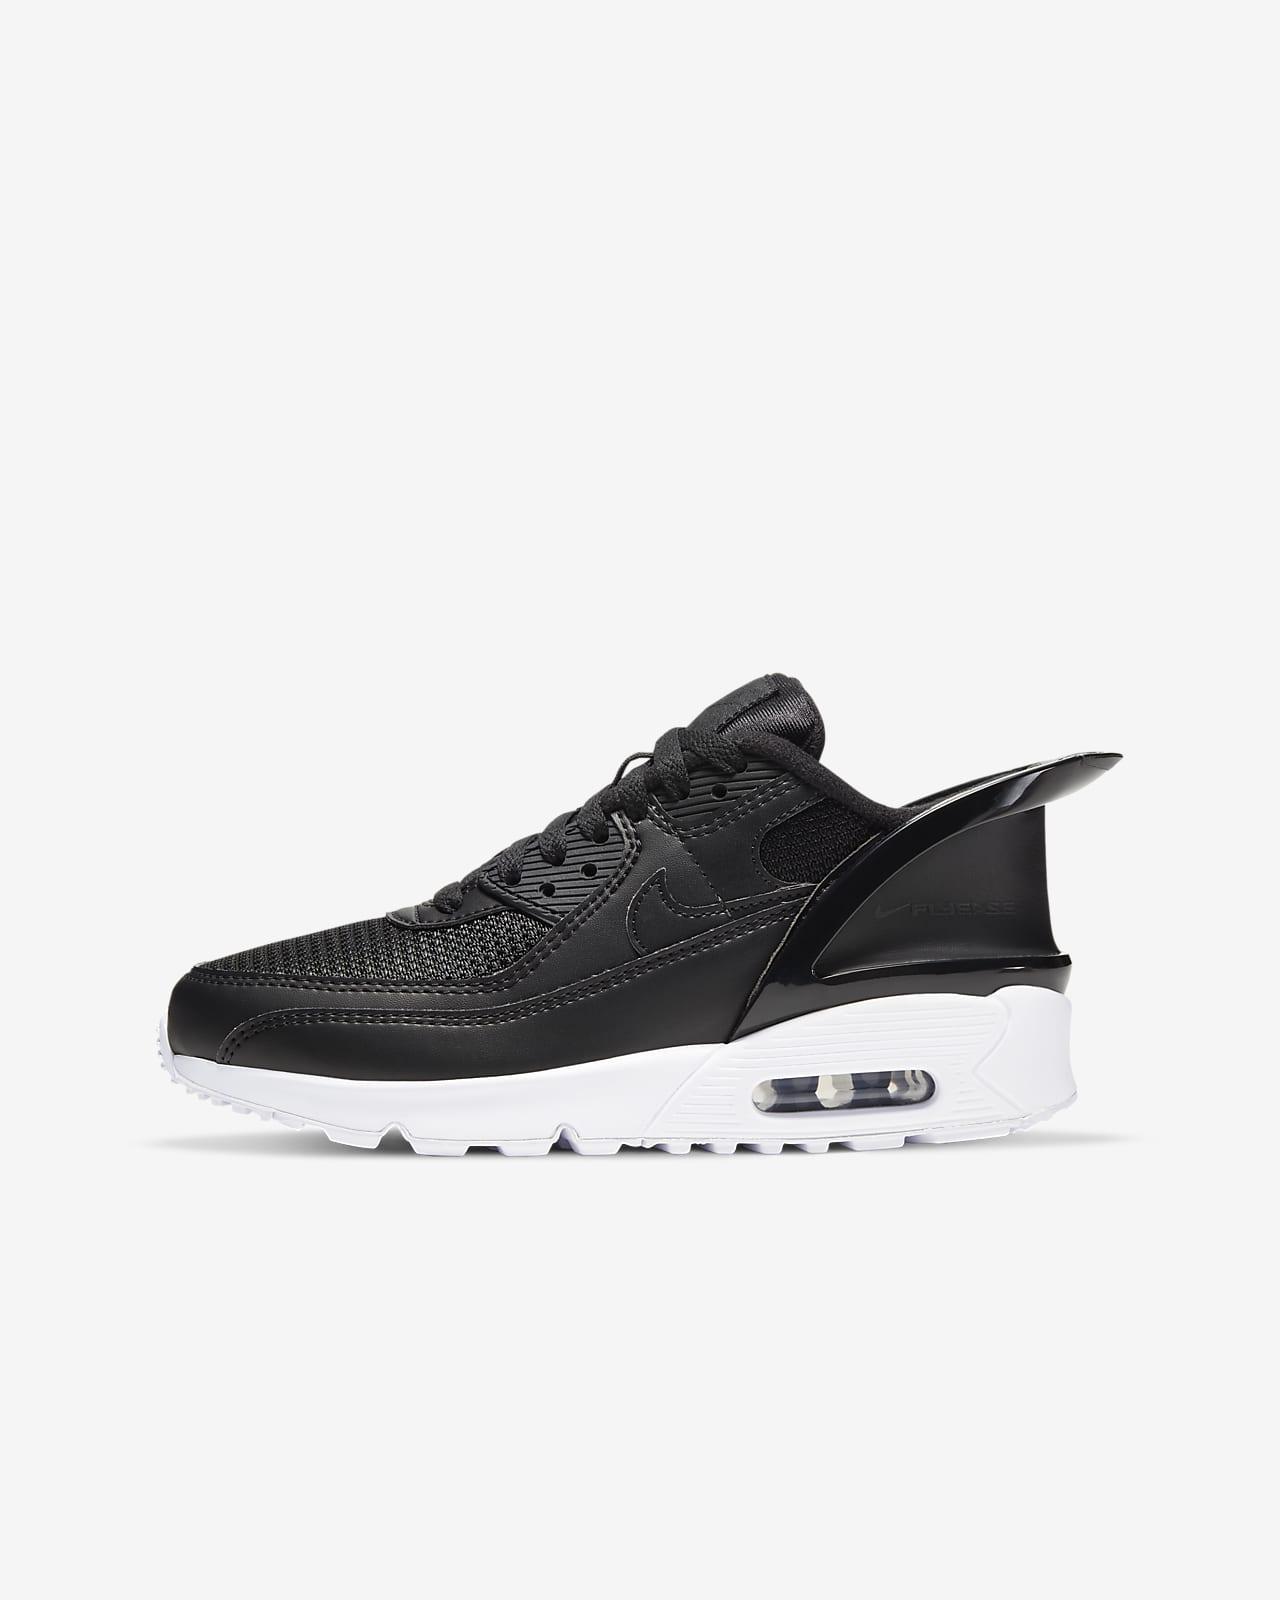 Nike Air Max 90 FlyEase Older Kids' Shoe